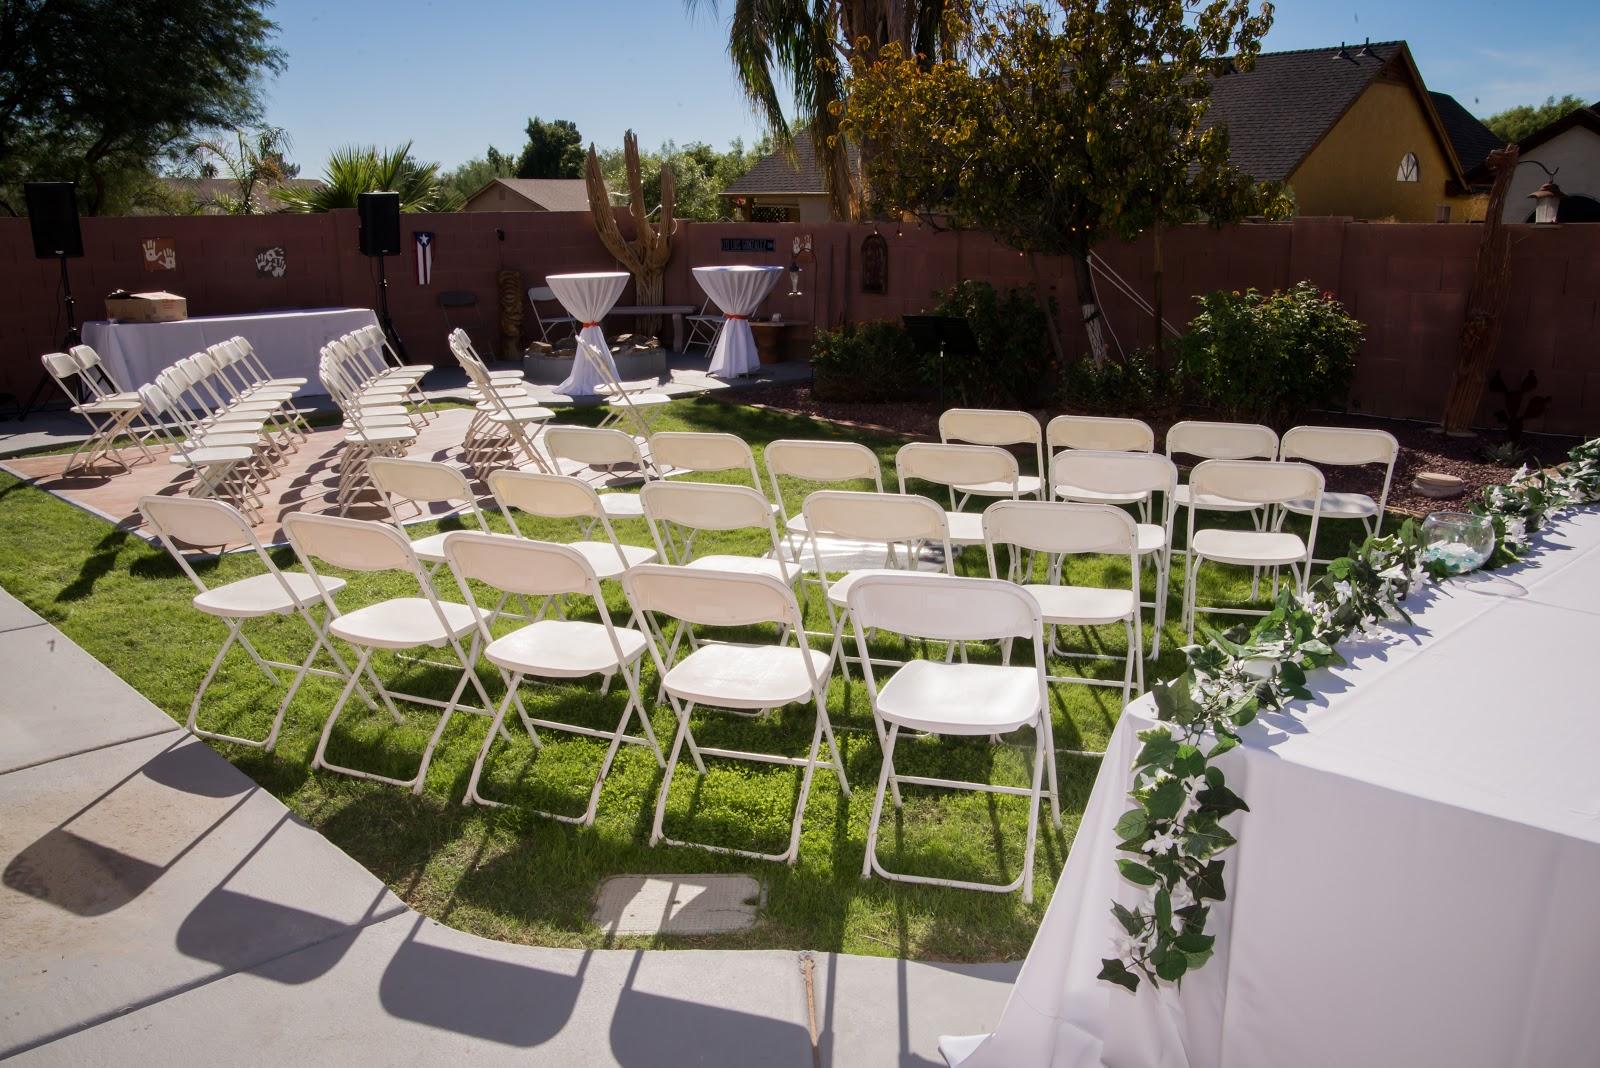 studio 616 photography wedding and portrait photography